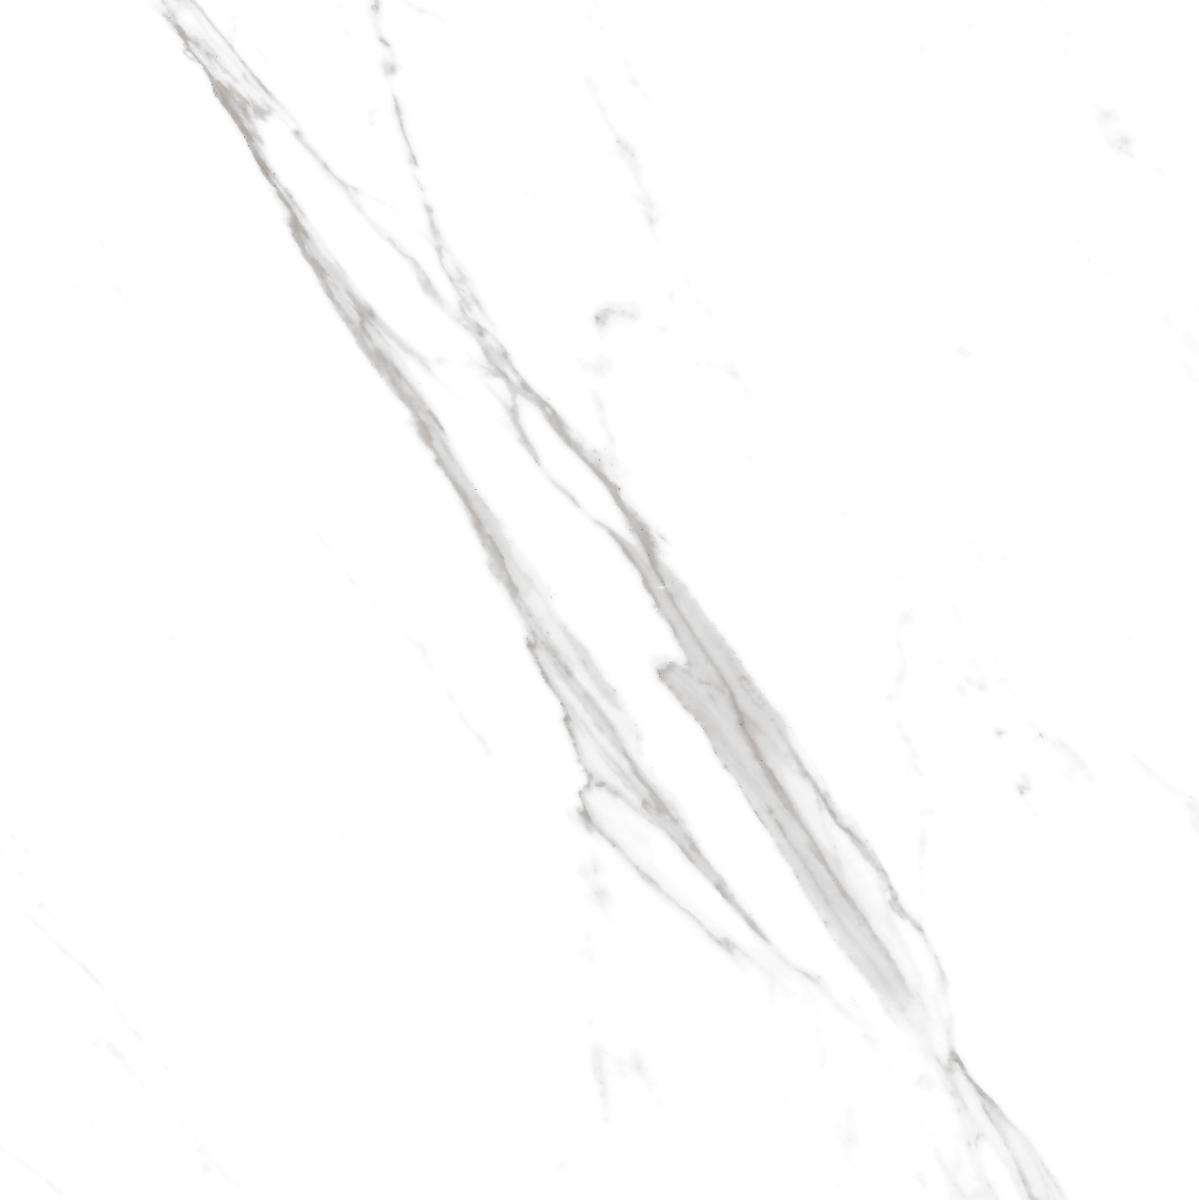 PGVT Carrara Bianco Marble